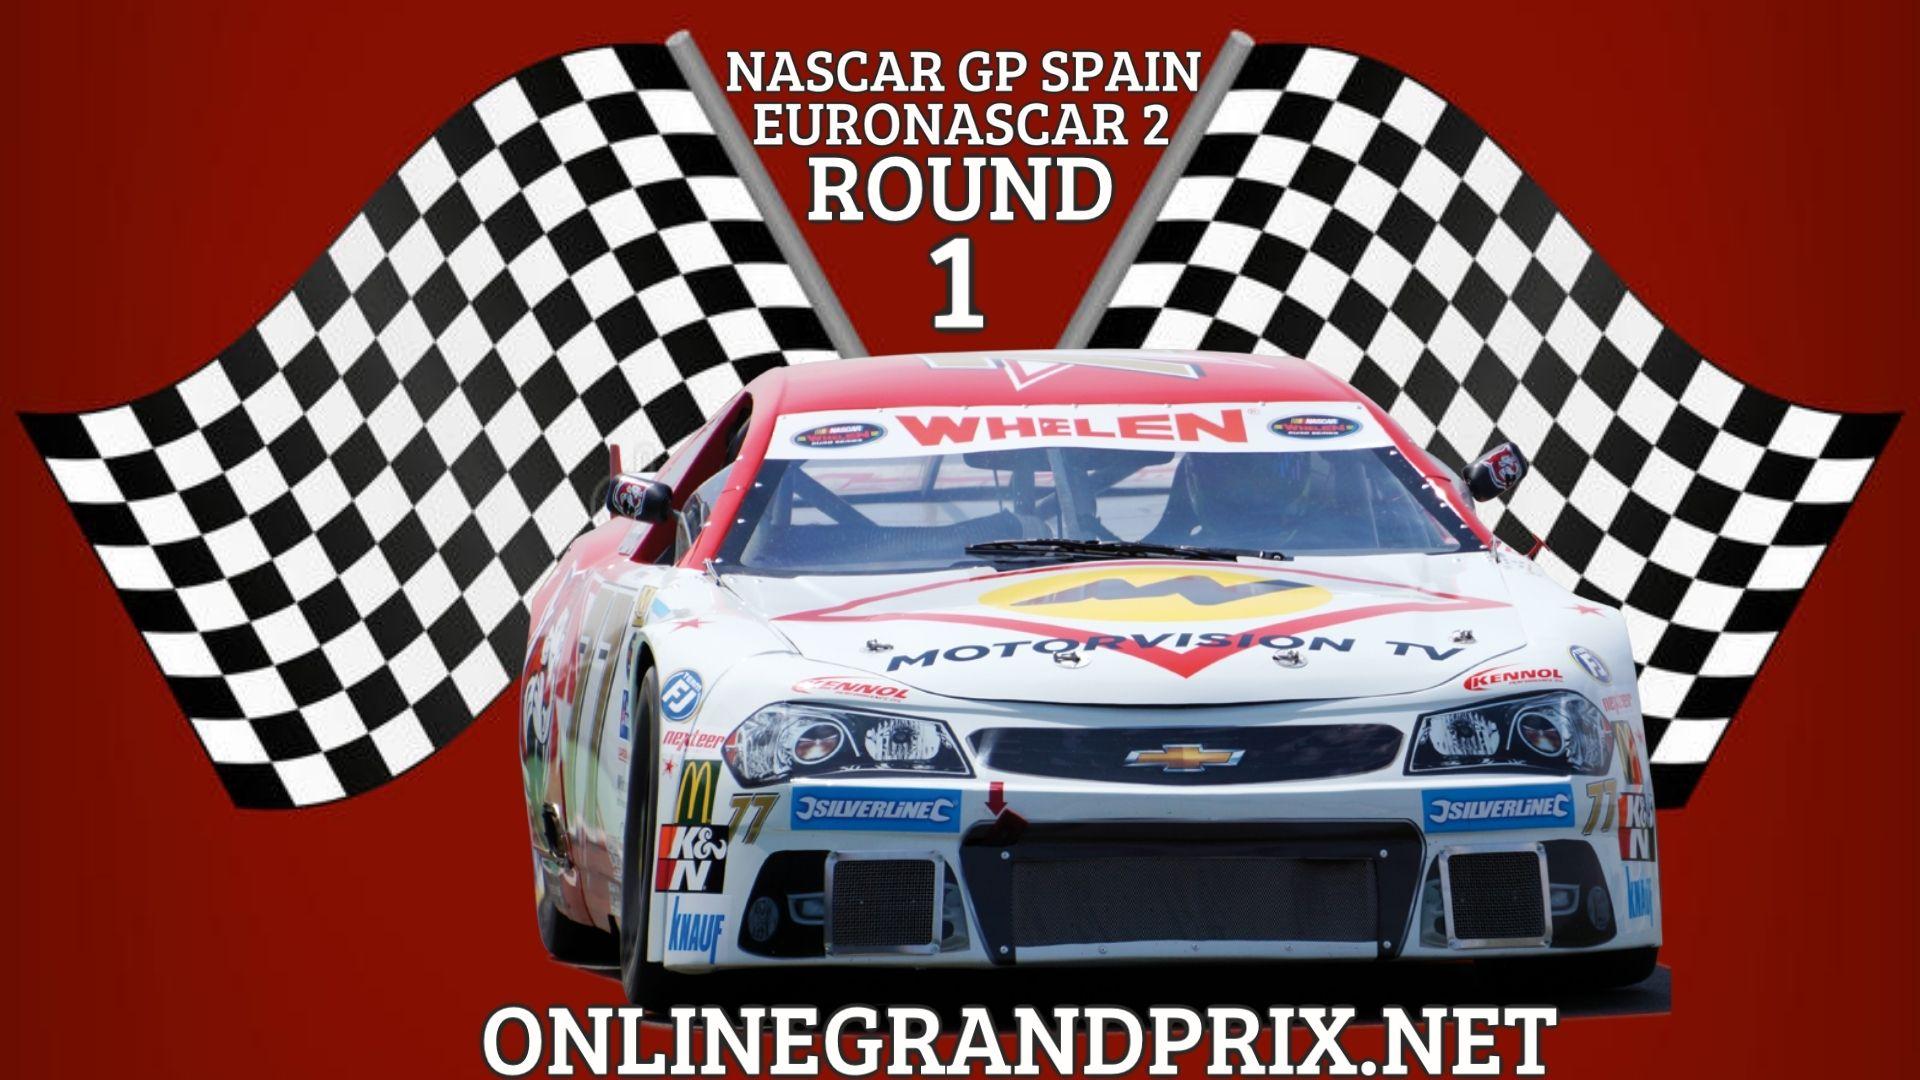 Spain NASCAR GP Live Stream 2021 | Euro NASCAR 2 RD 1